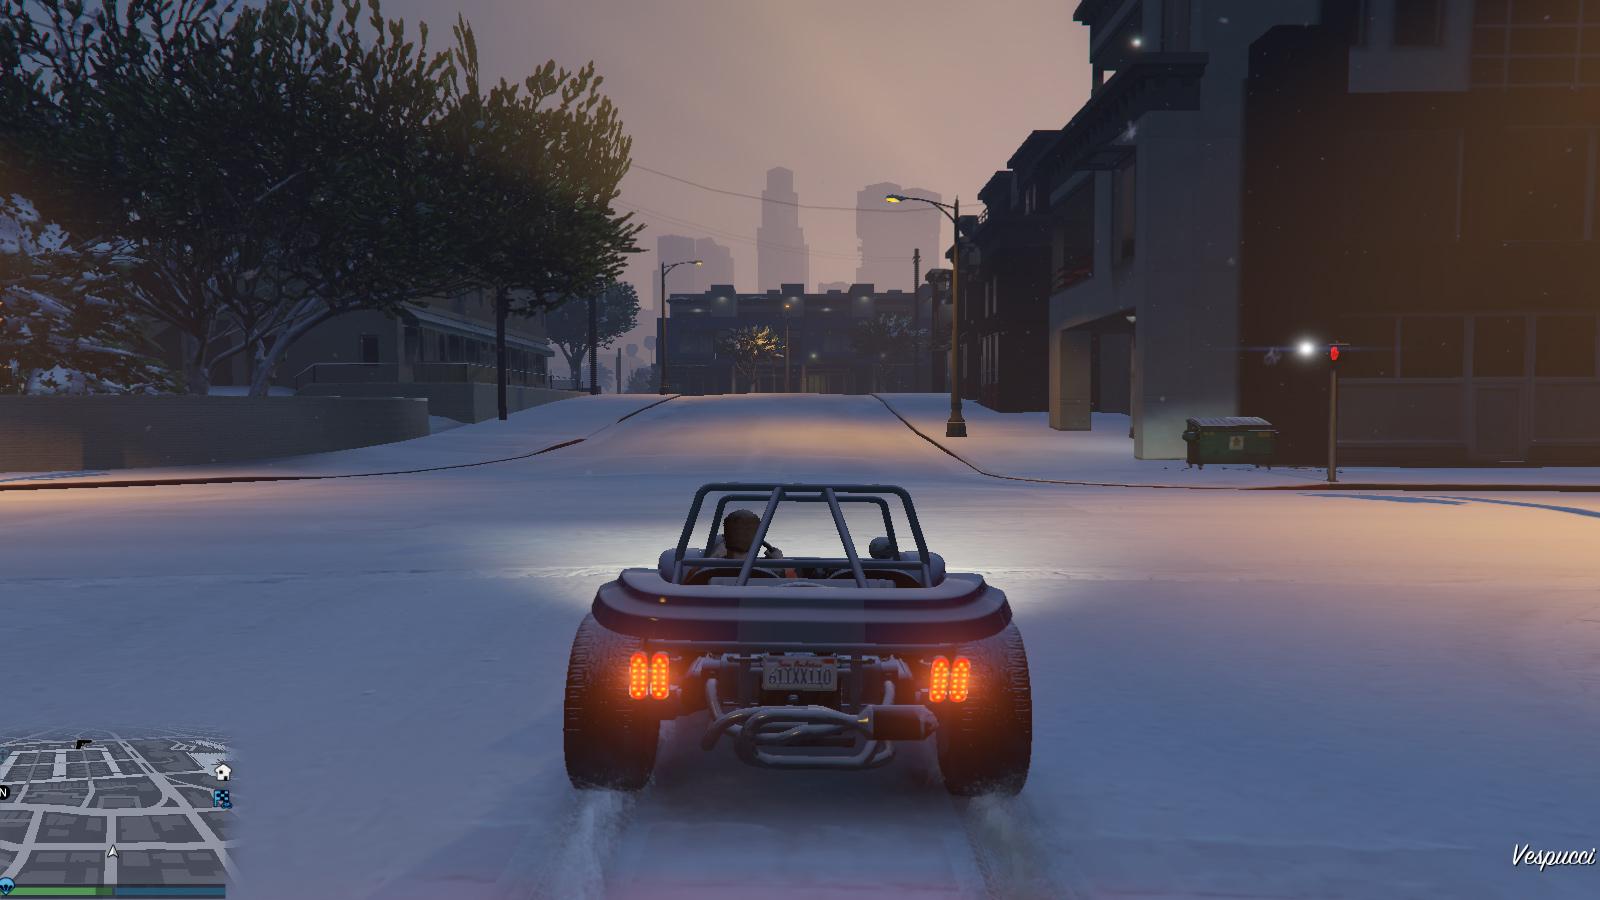 GTA 5 PC New Mod Adds Snow To GTA Online VG247